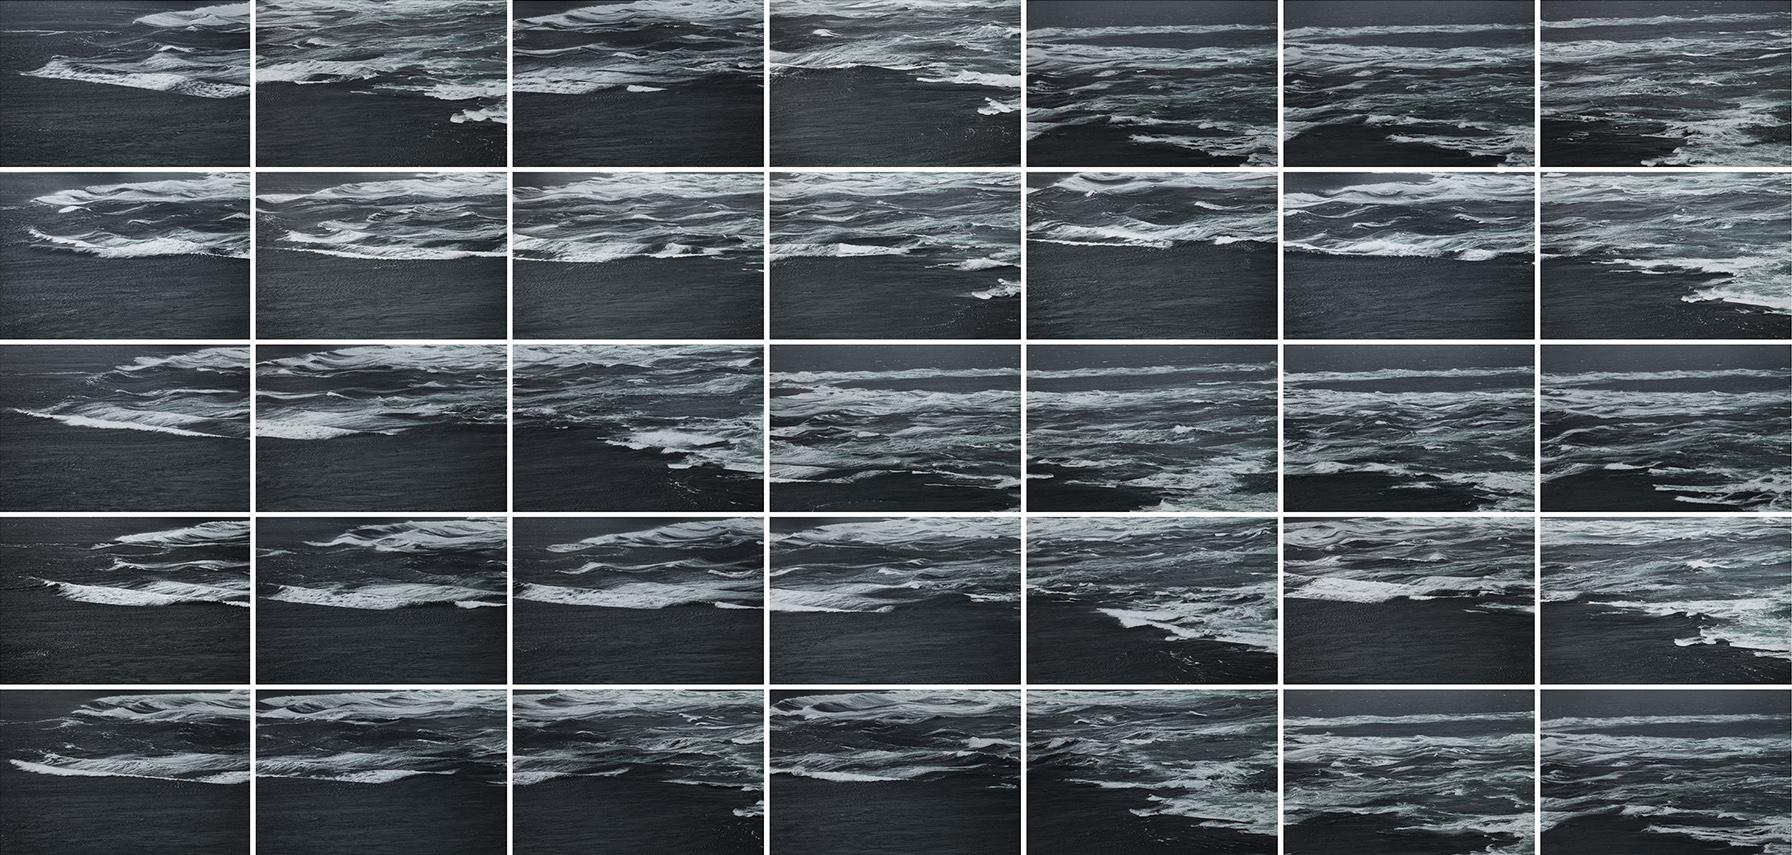 MMV-IV Storm grid